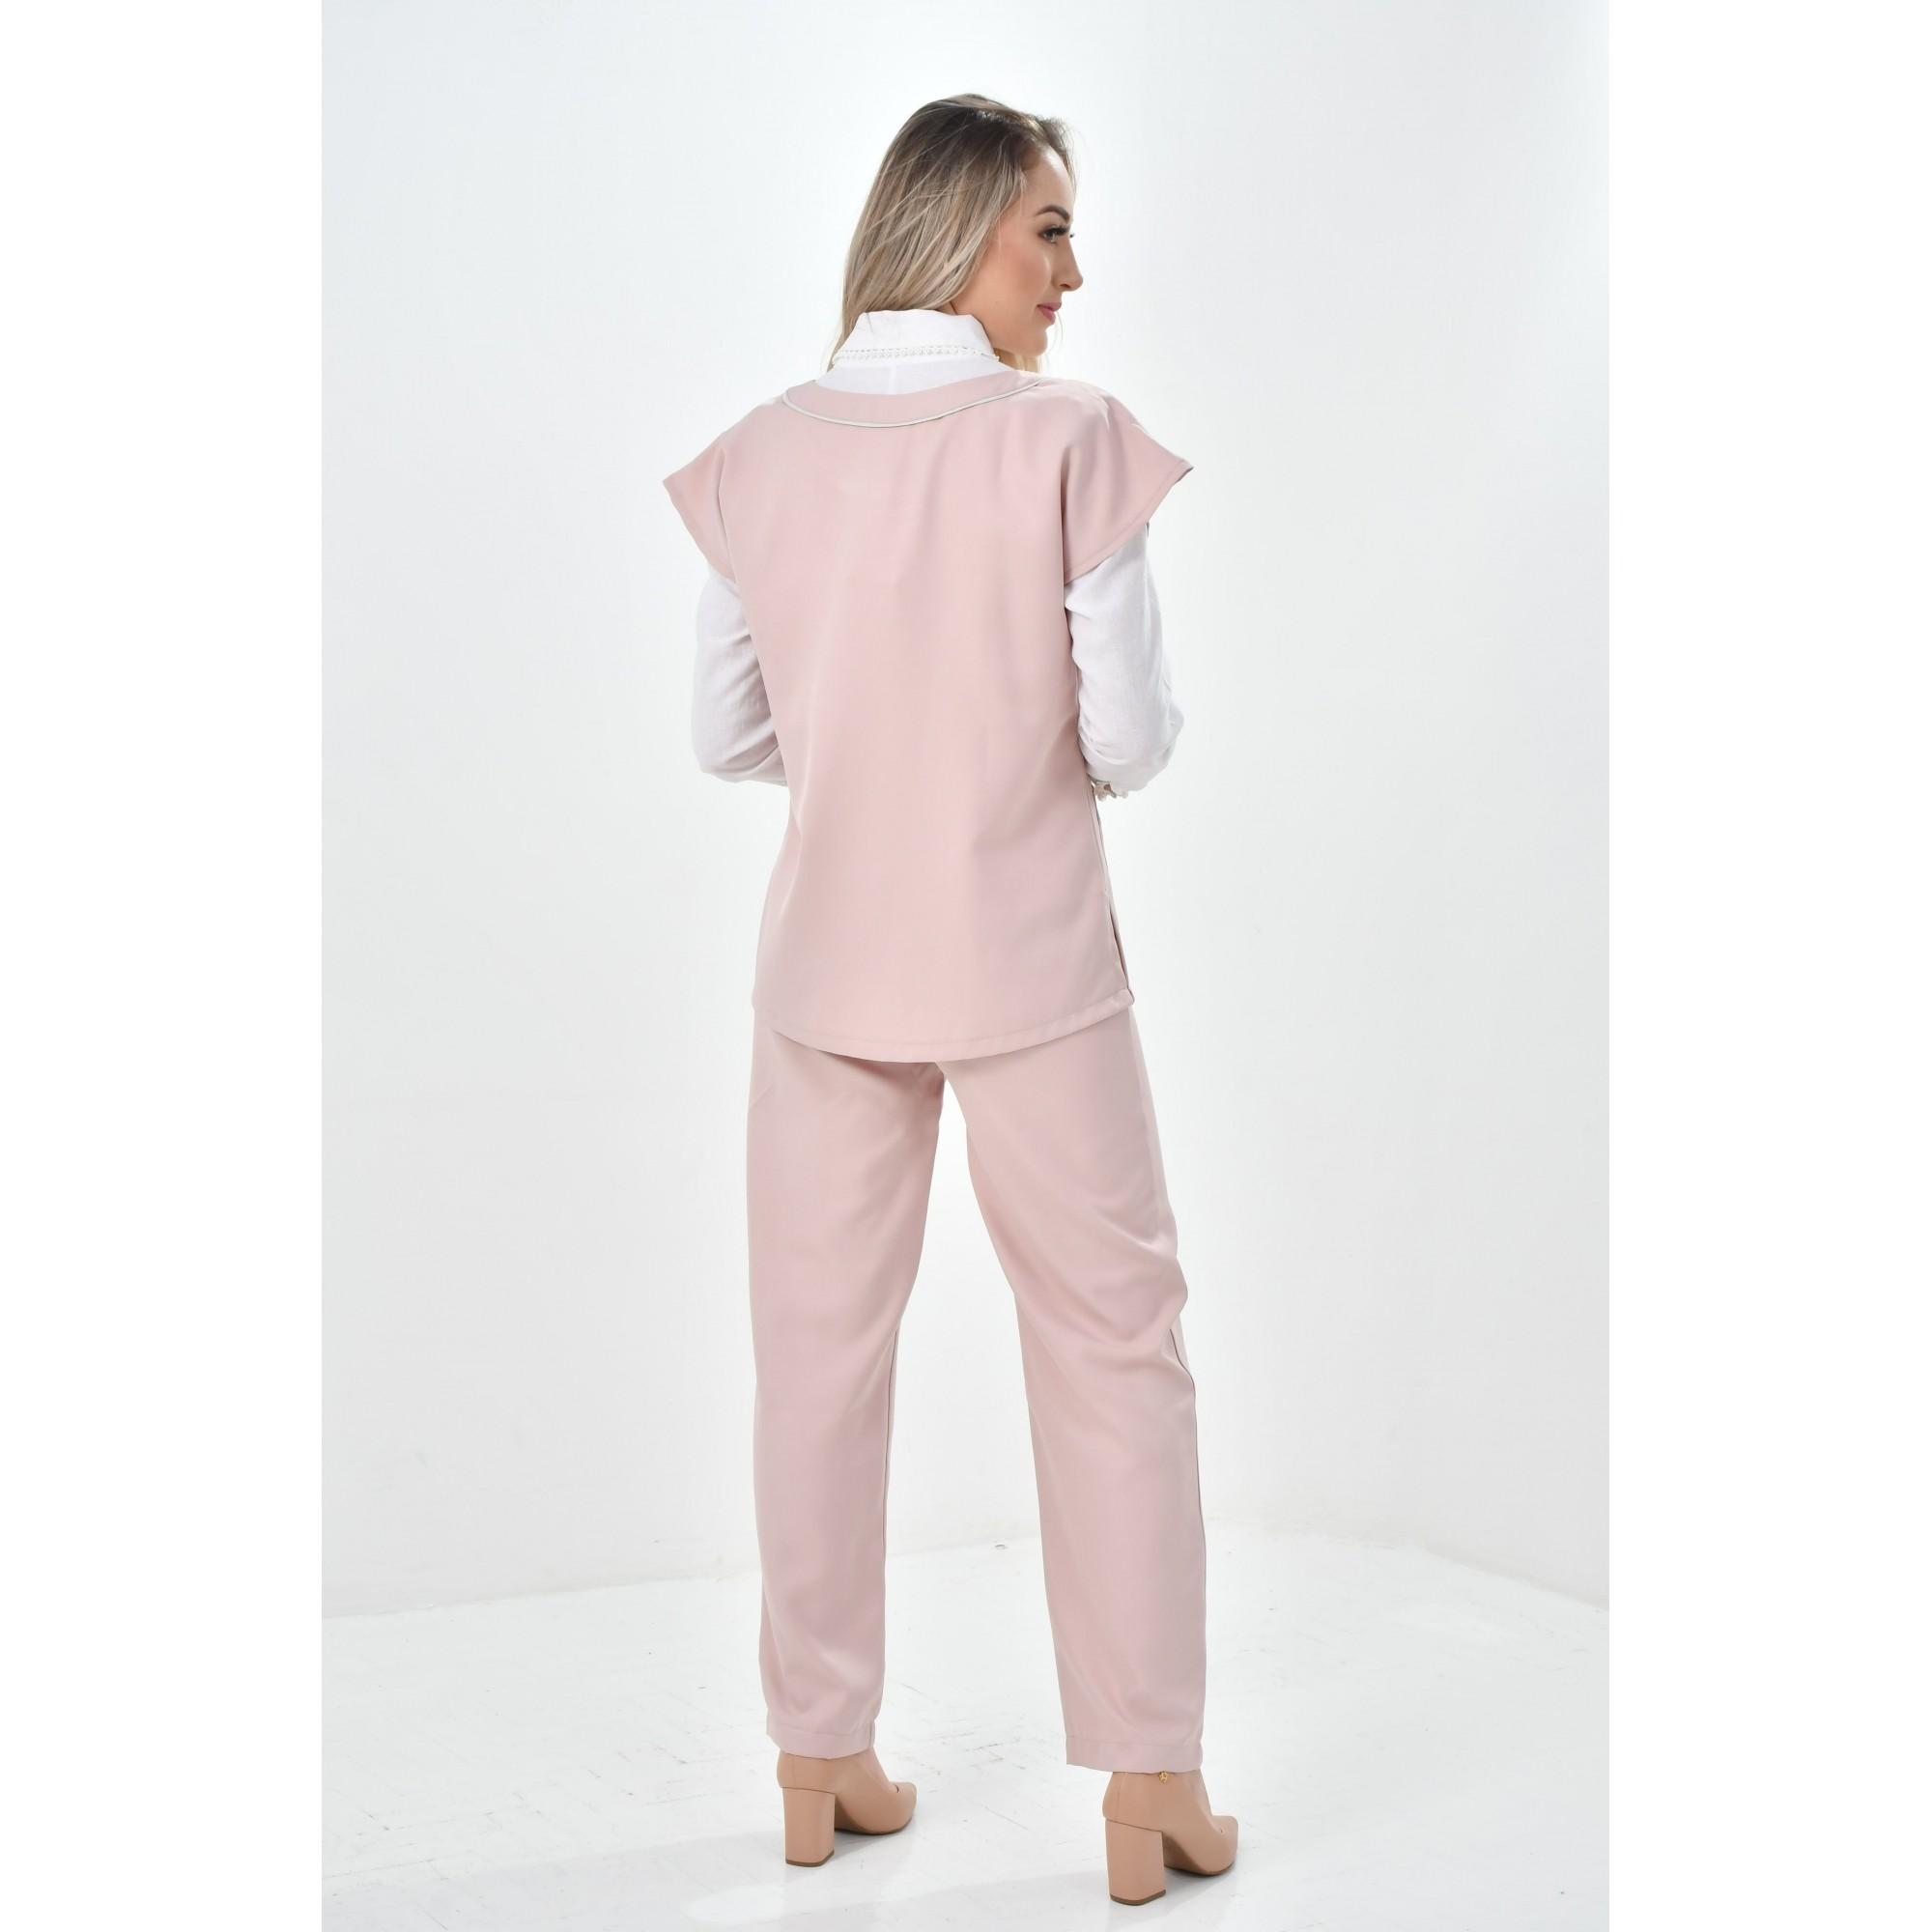 Scrub Feminino Com Decote Redondo  - Luxo Branco - Jalecos Personalizado Feminino